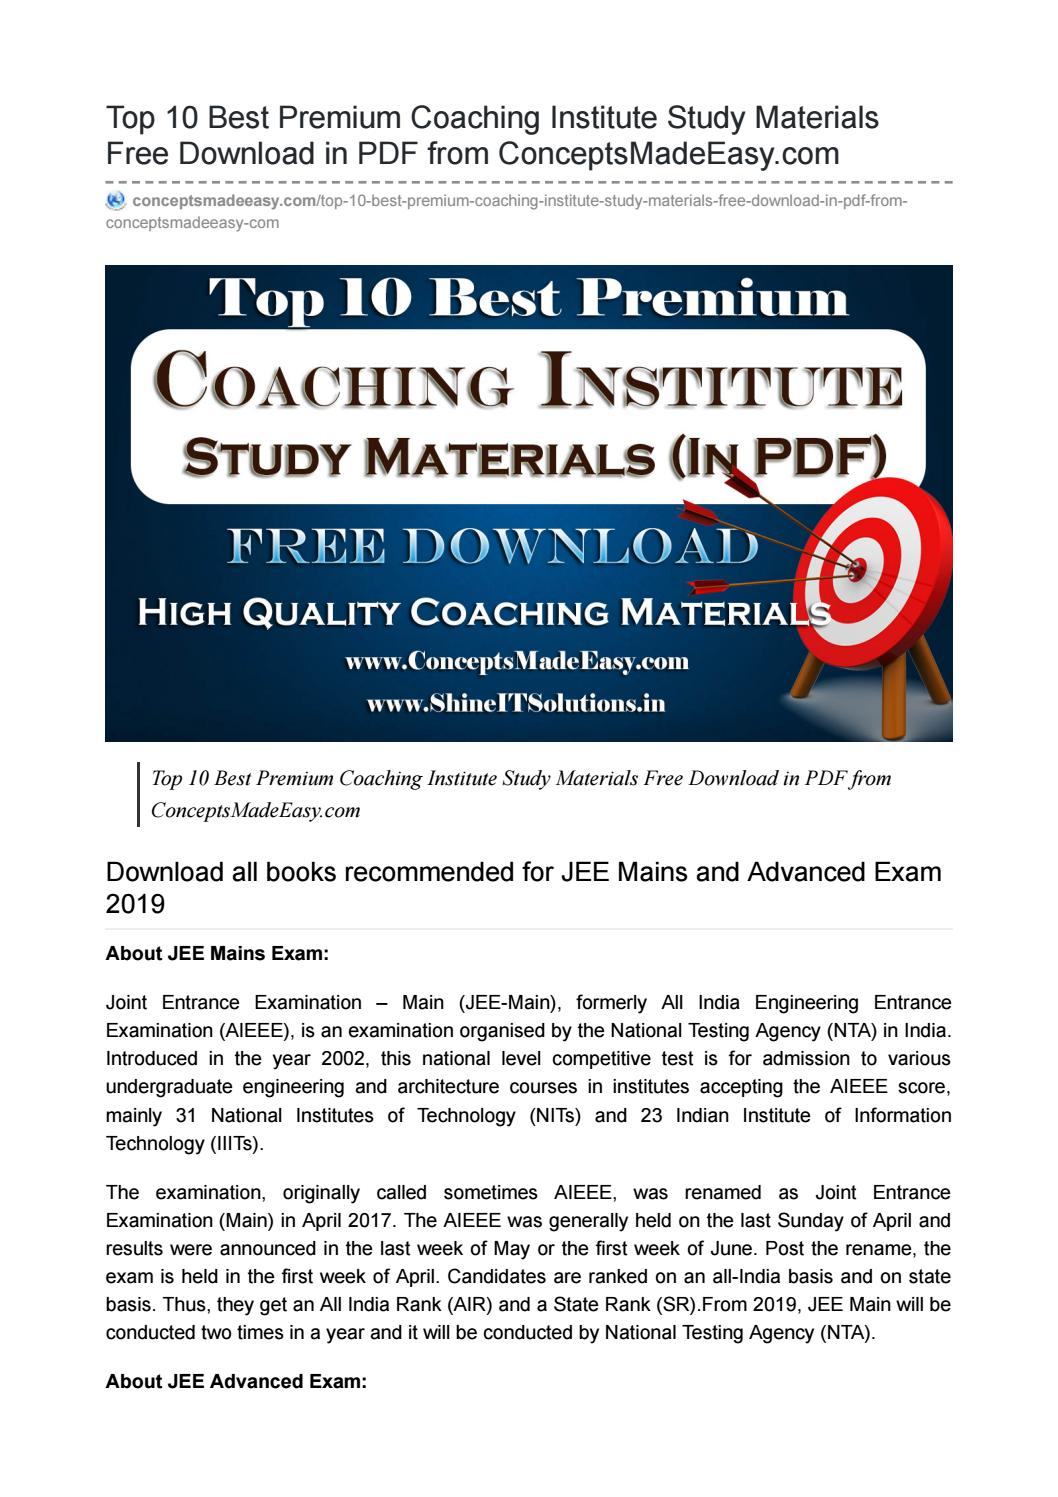 jee mains study material pdf free download